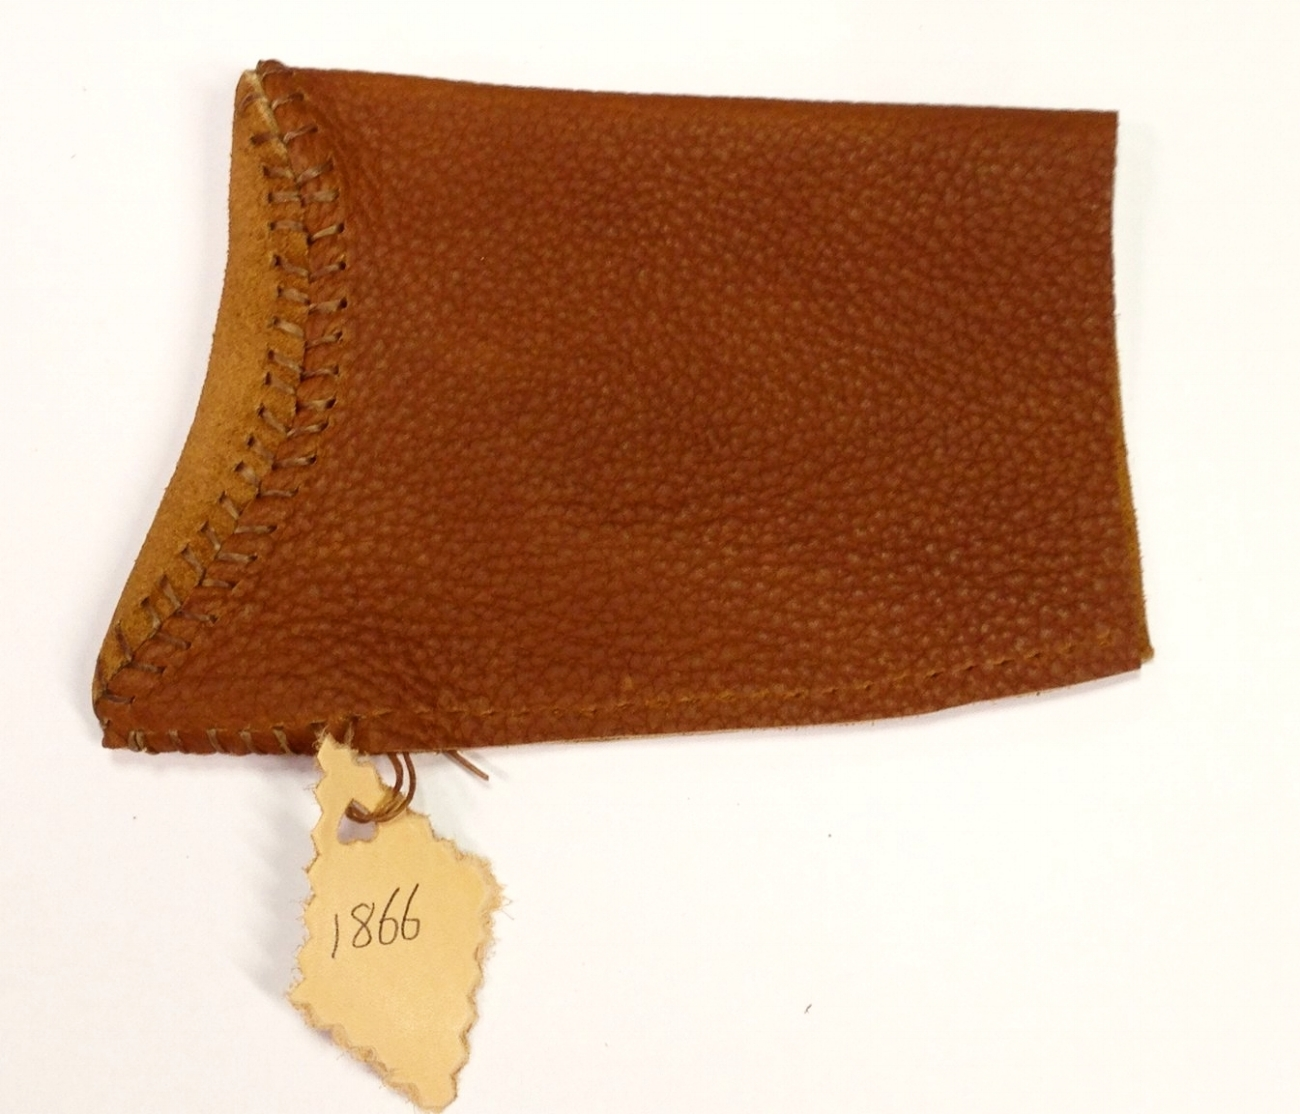 1866 Uberti Rifle Cover